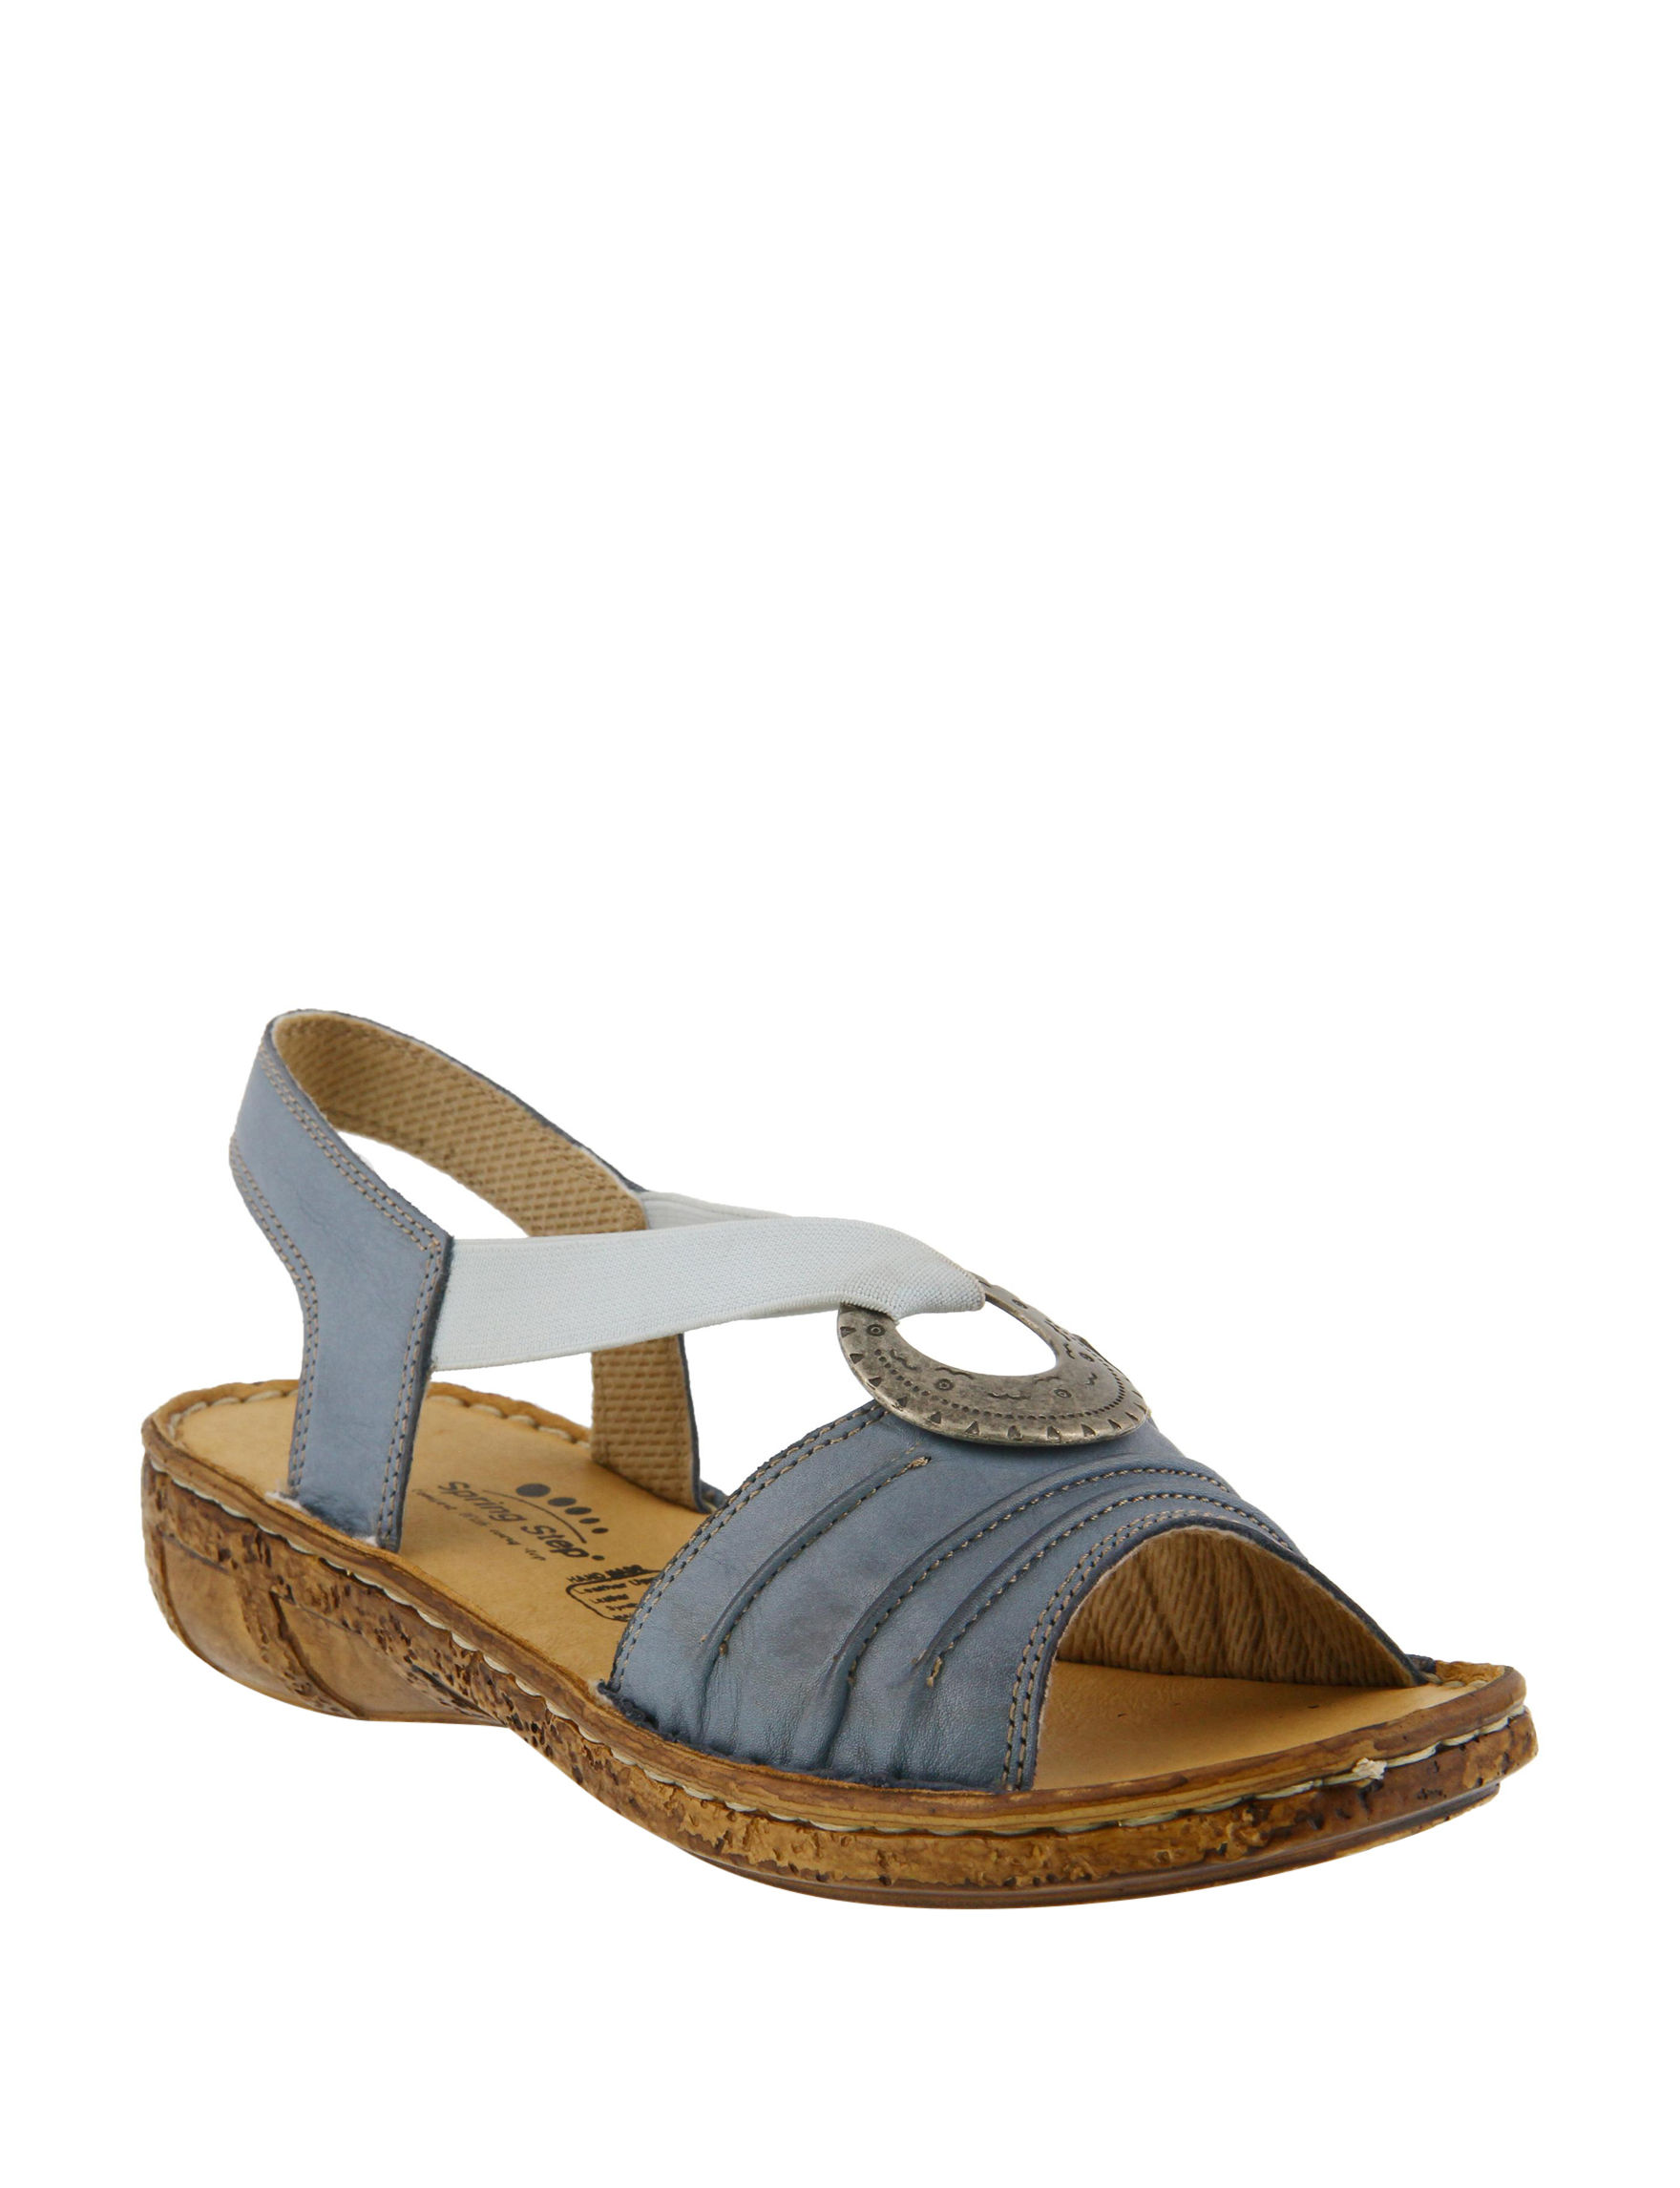 Spring Step Denim Flat Sandals